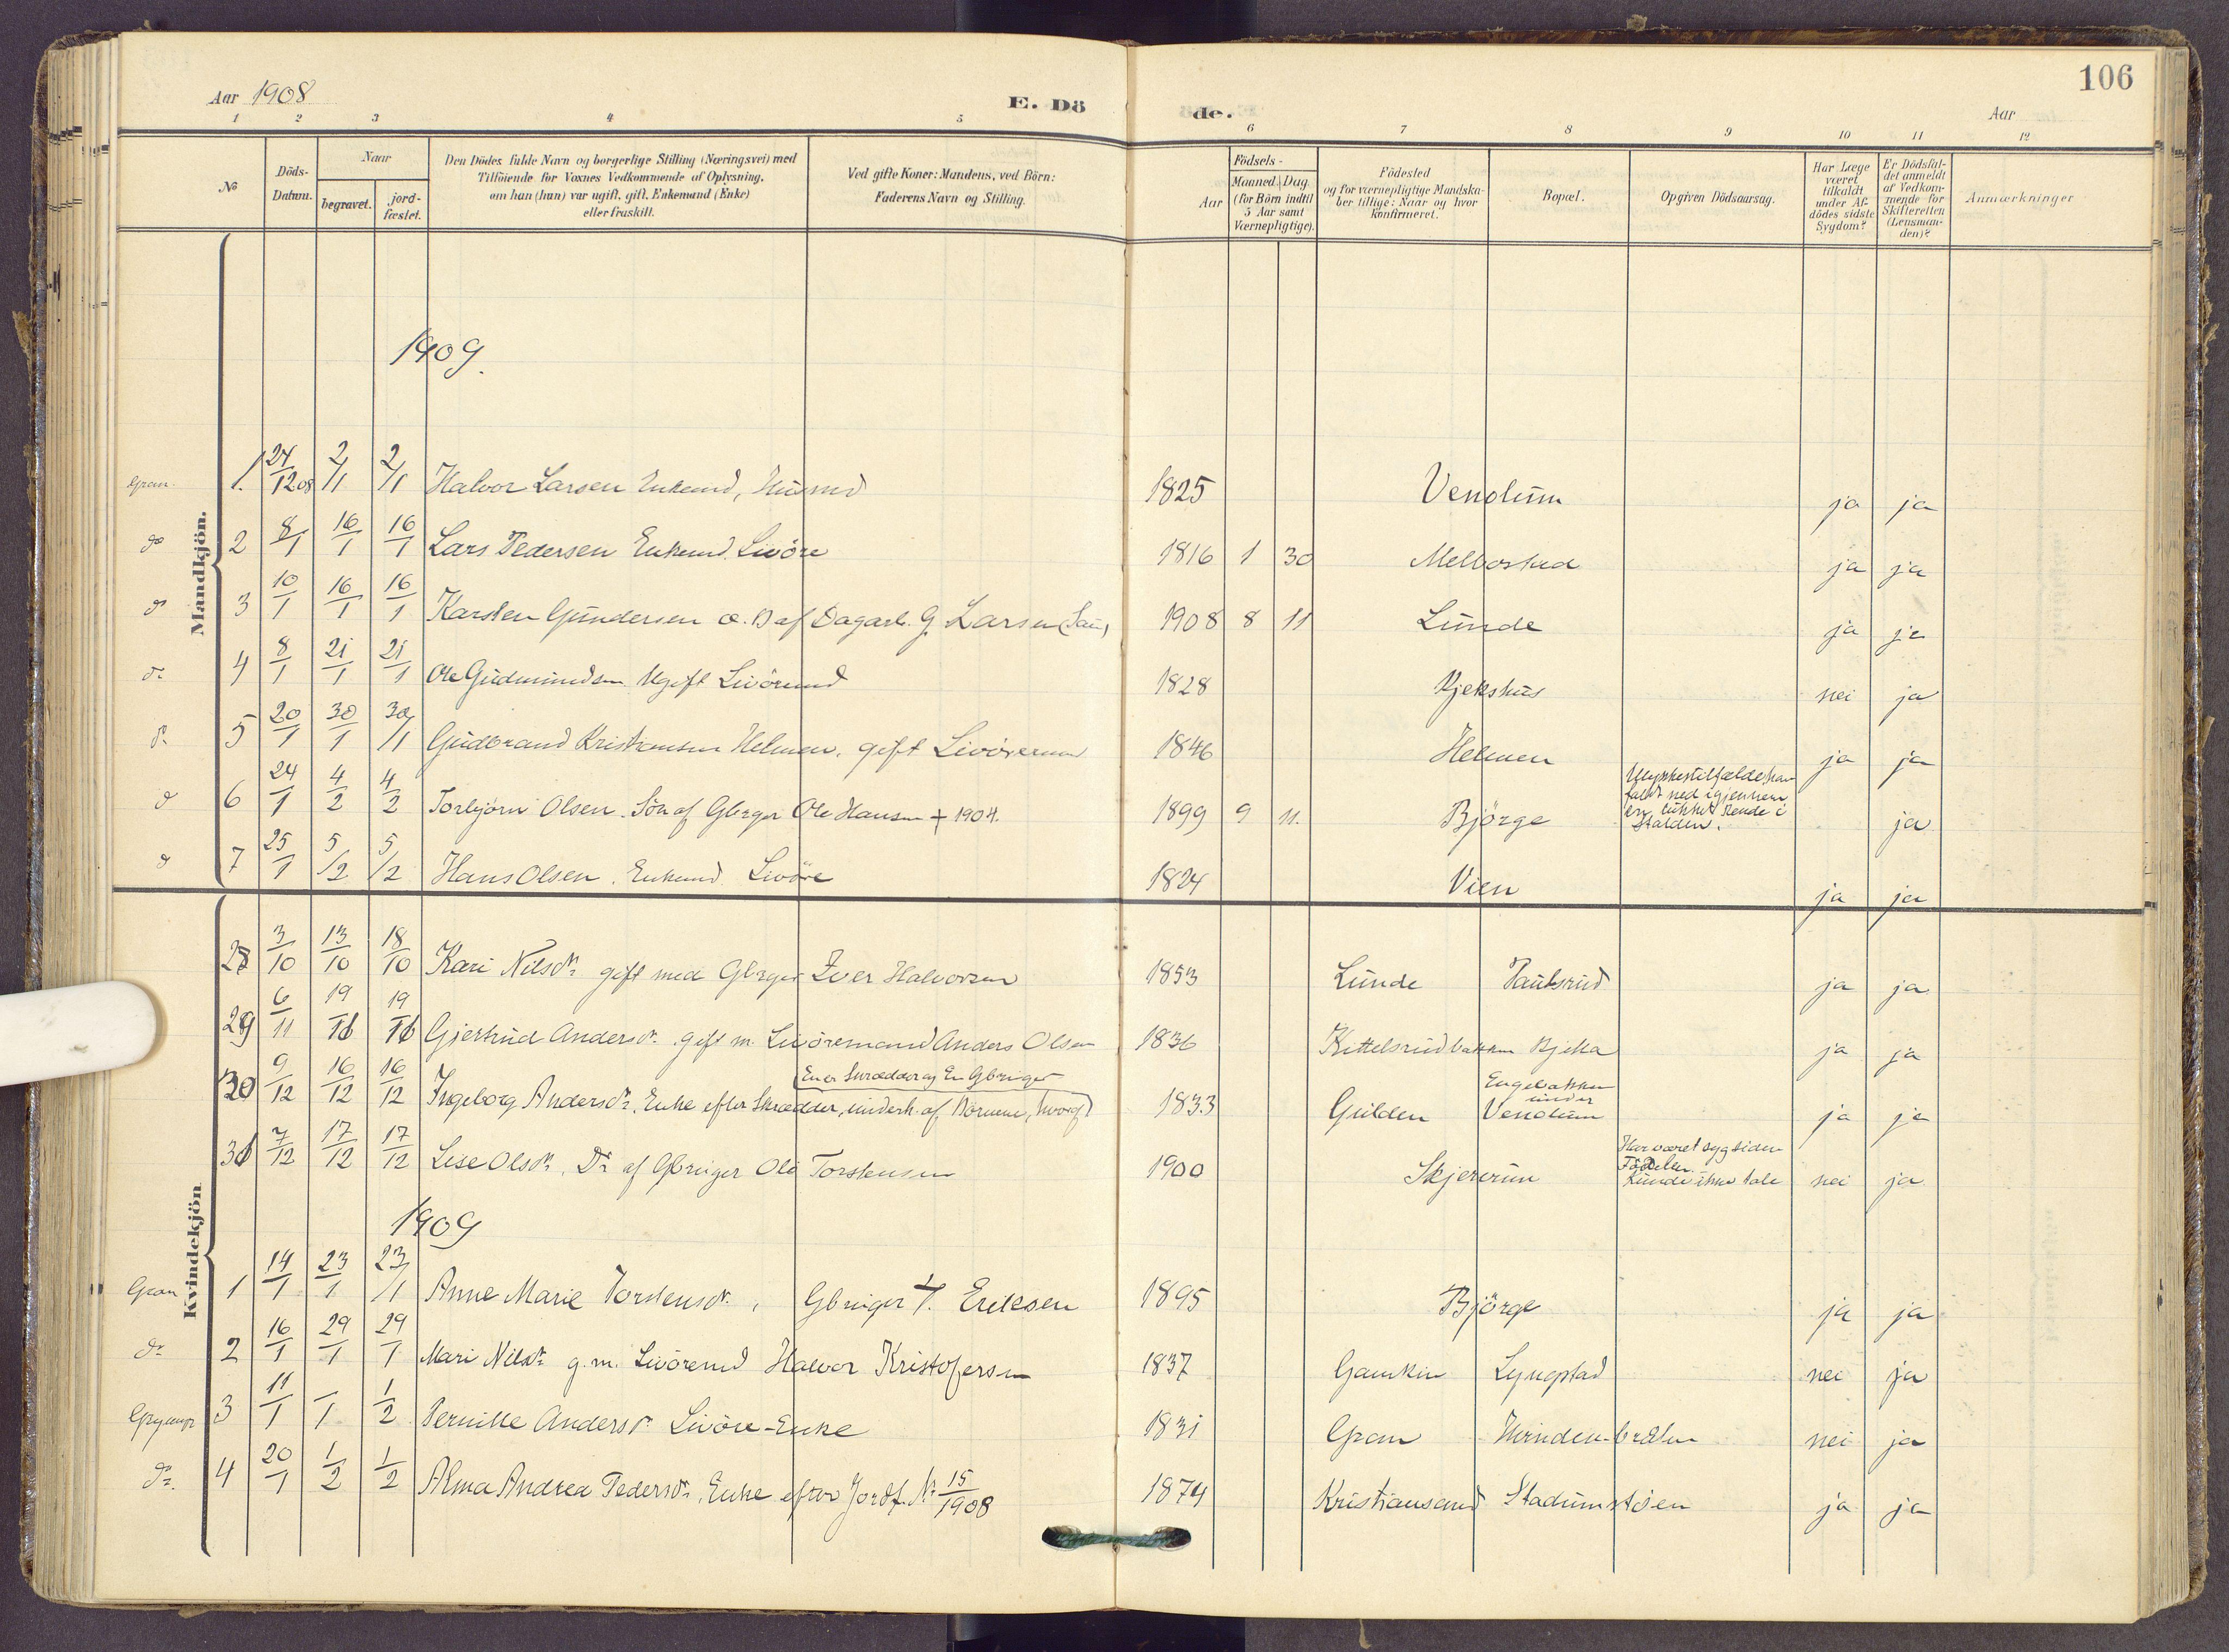 SAH, Gran prestekontor, Ministerialbok nr. 22, 1908-1918, s. 106